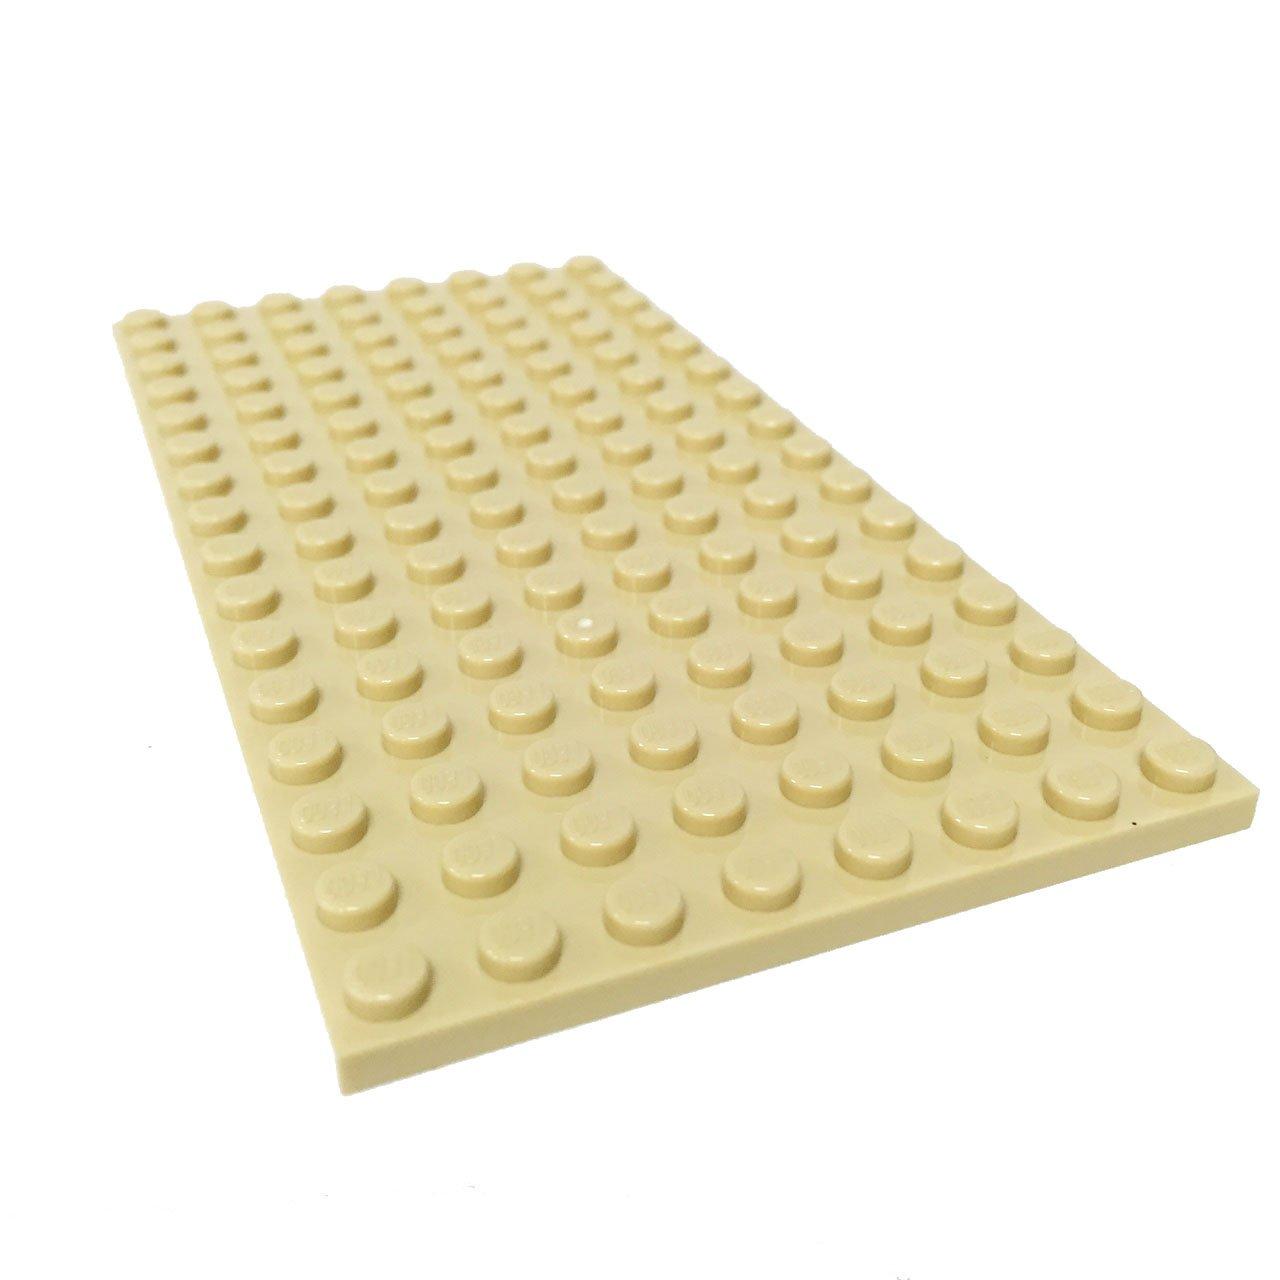 Lego Plate 8 x 16 Tan Sand Baseplate 41101 Beach